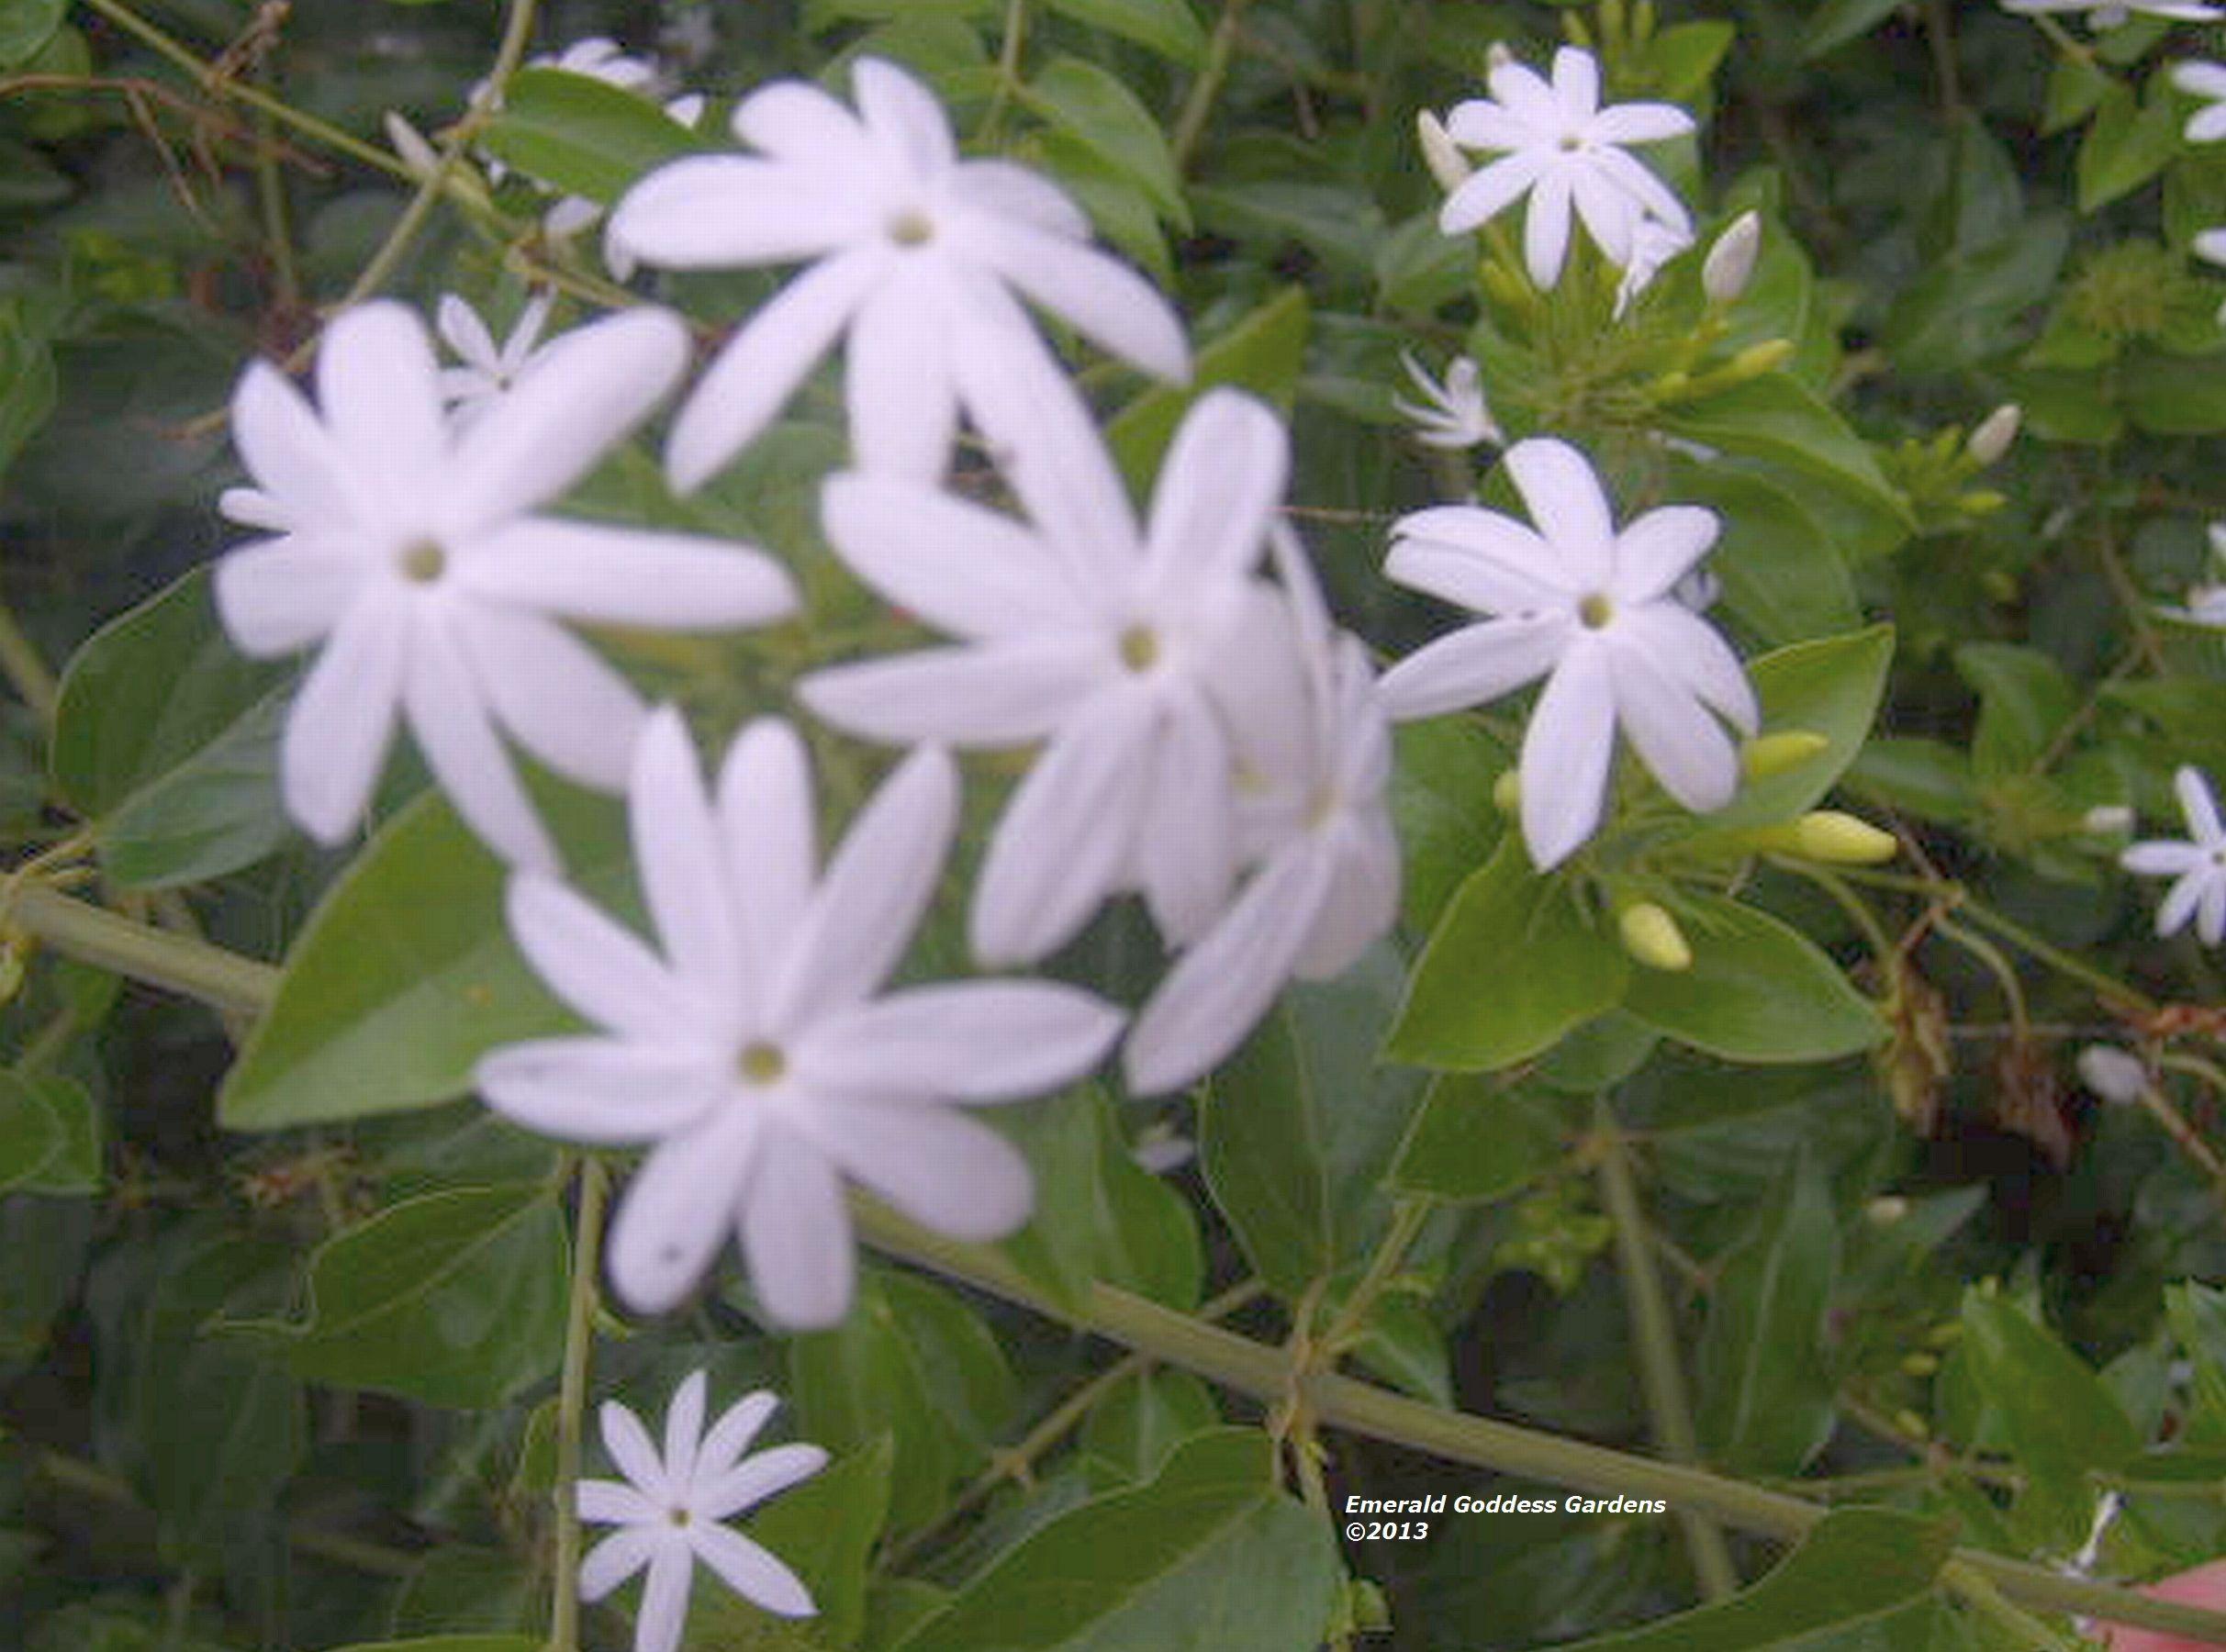 Jasmine multiflorum plant downy white fragrant flowers as plantas jasmine multiflorum plant downy white fragrant flowers izmirmasajfo Gallery